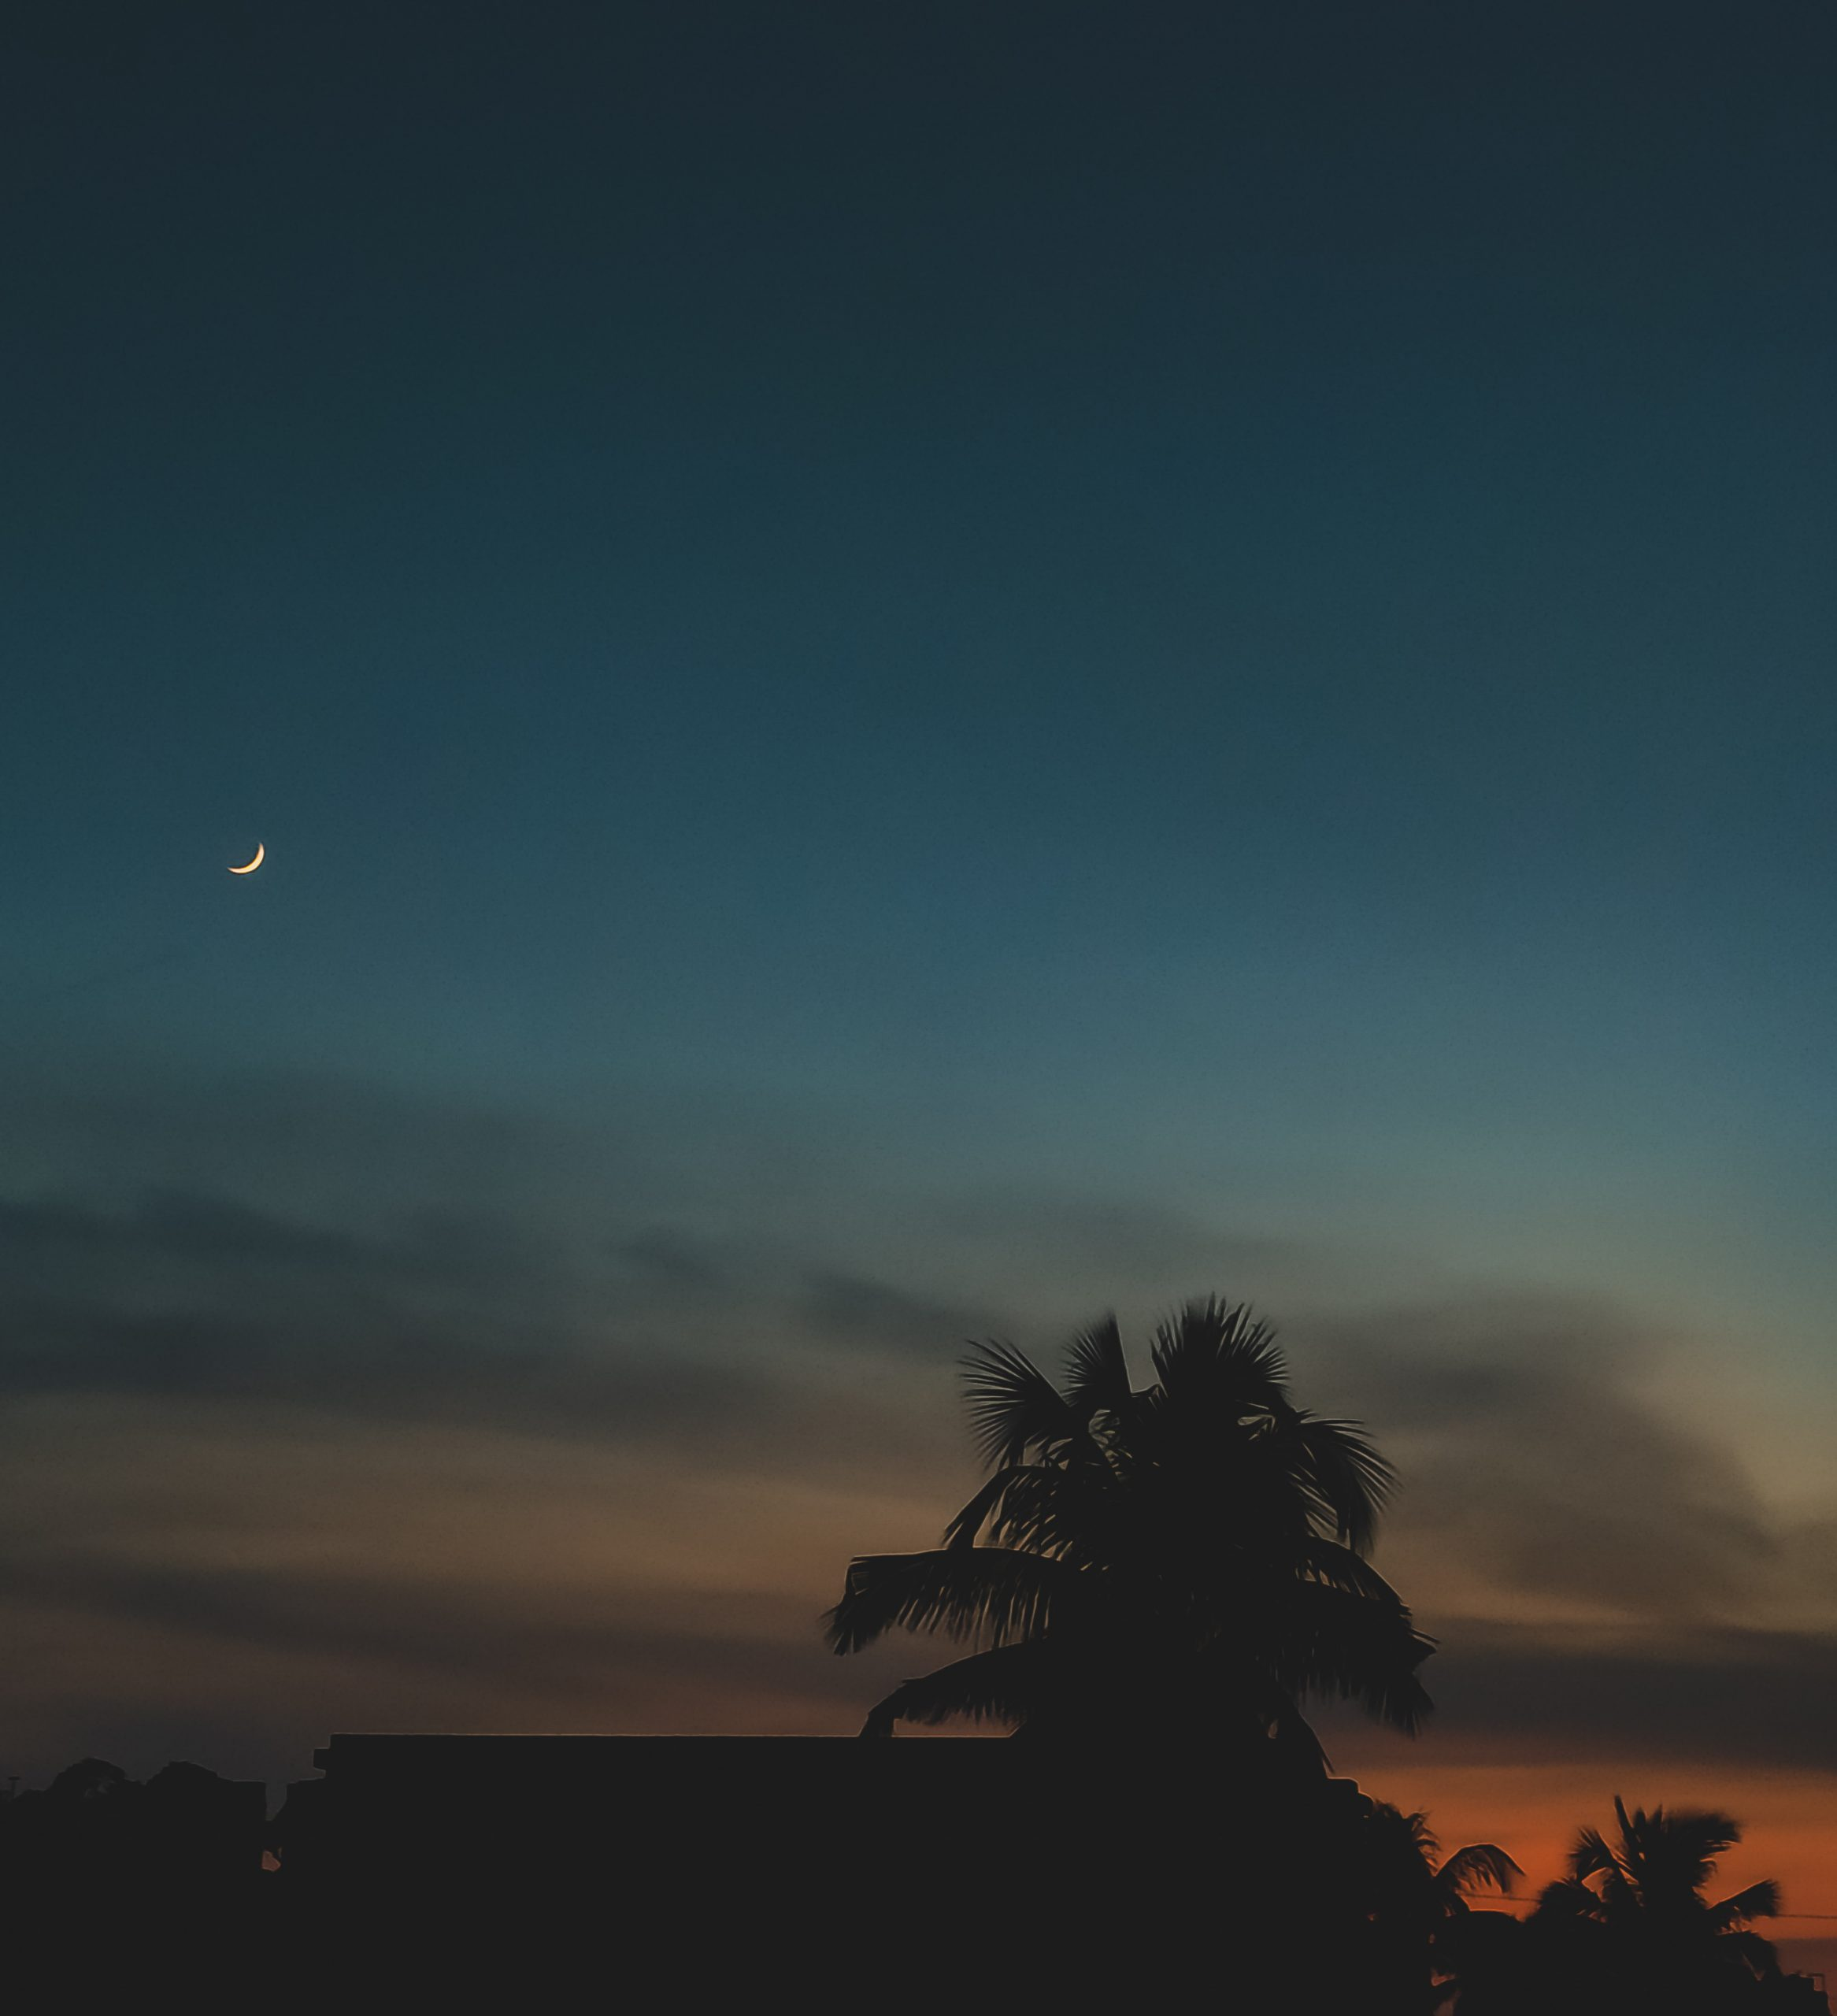 Silhouette Scenery